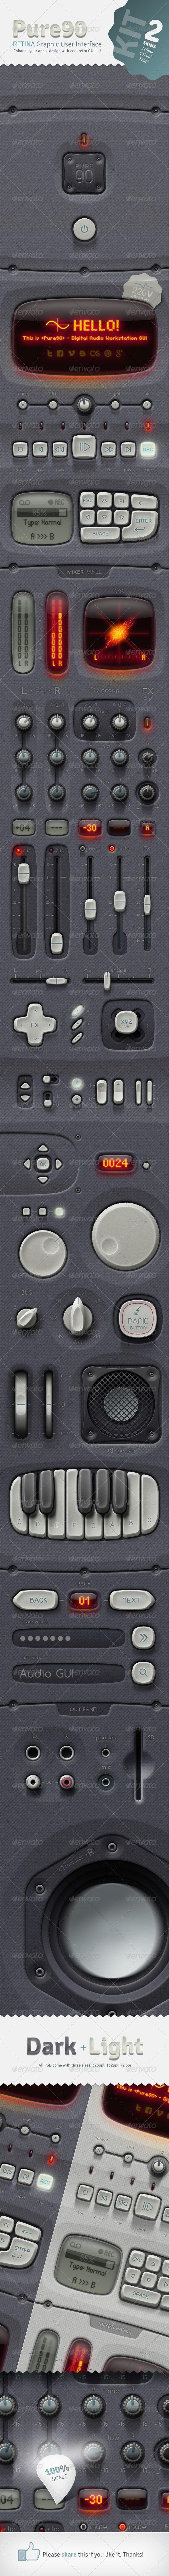 Pure90 - Retina Digital Audio Workstation GUI Kit